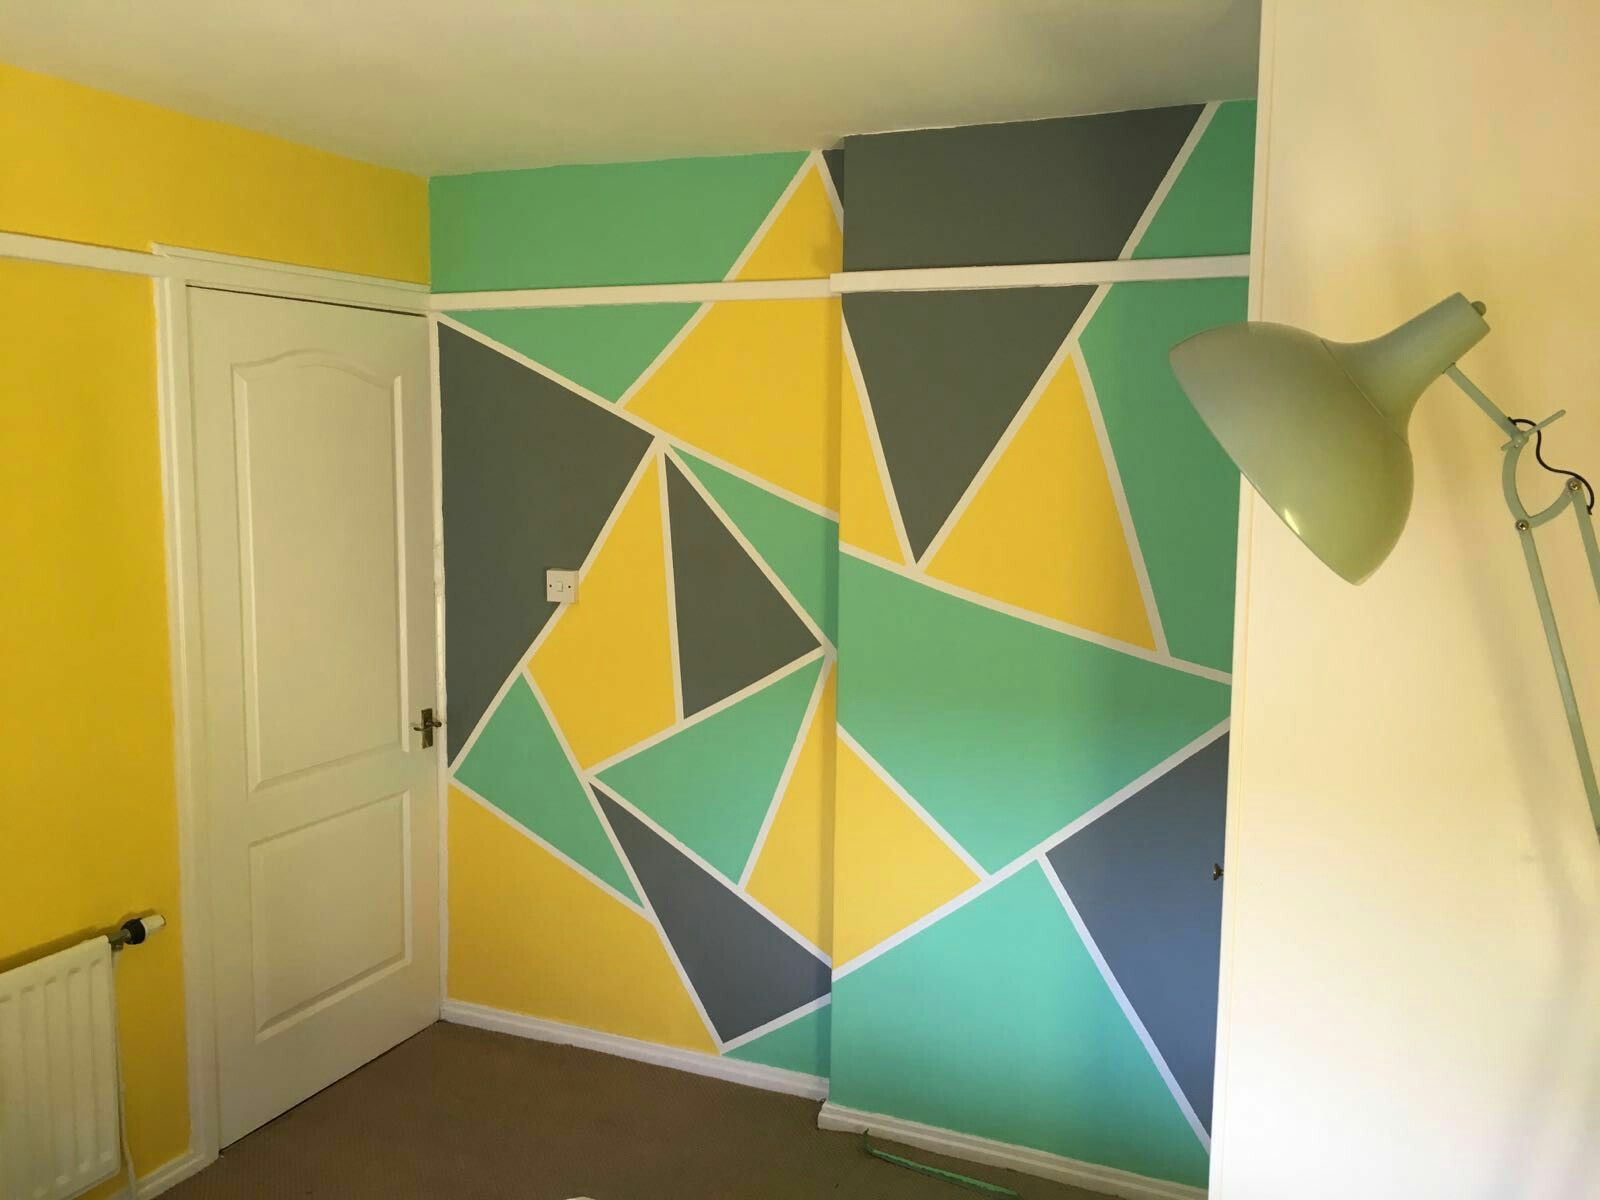 Wall painting idea using frog tape. | falfestés minta | Pinterest ...